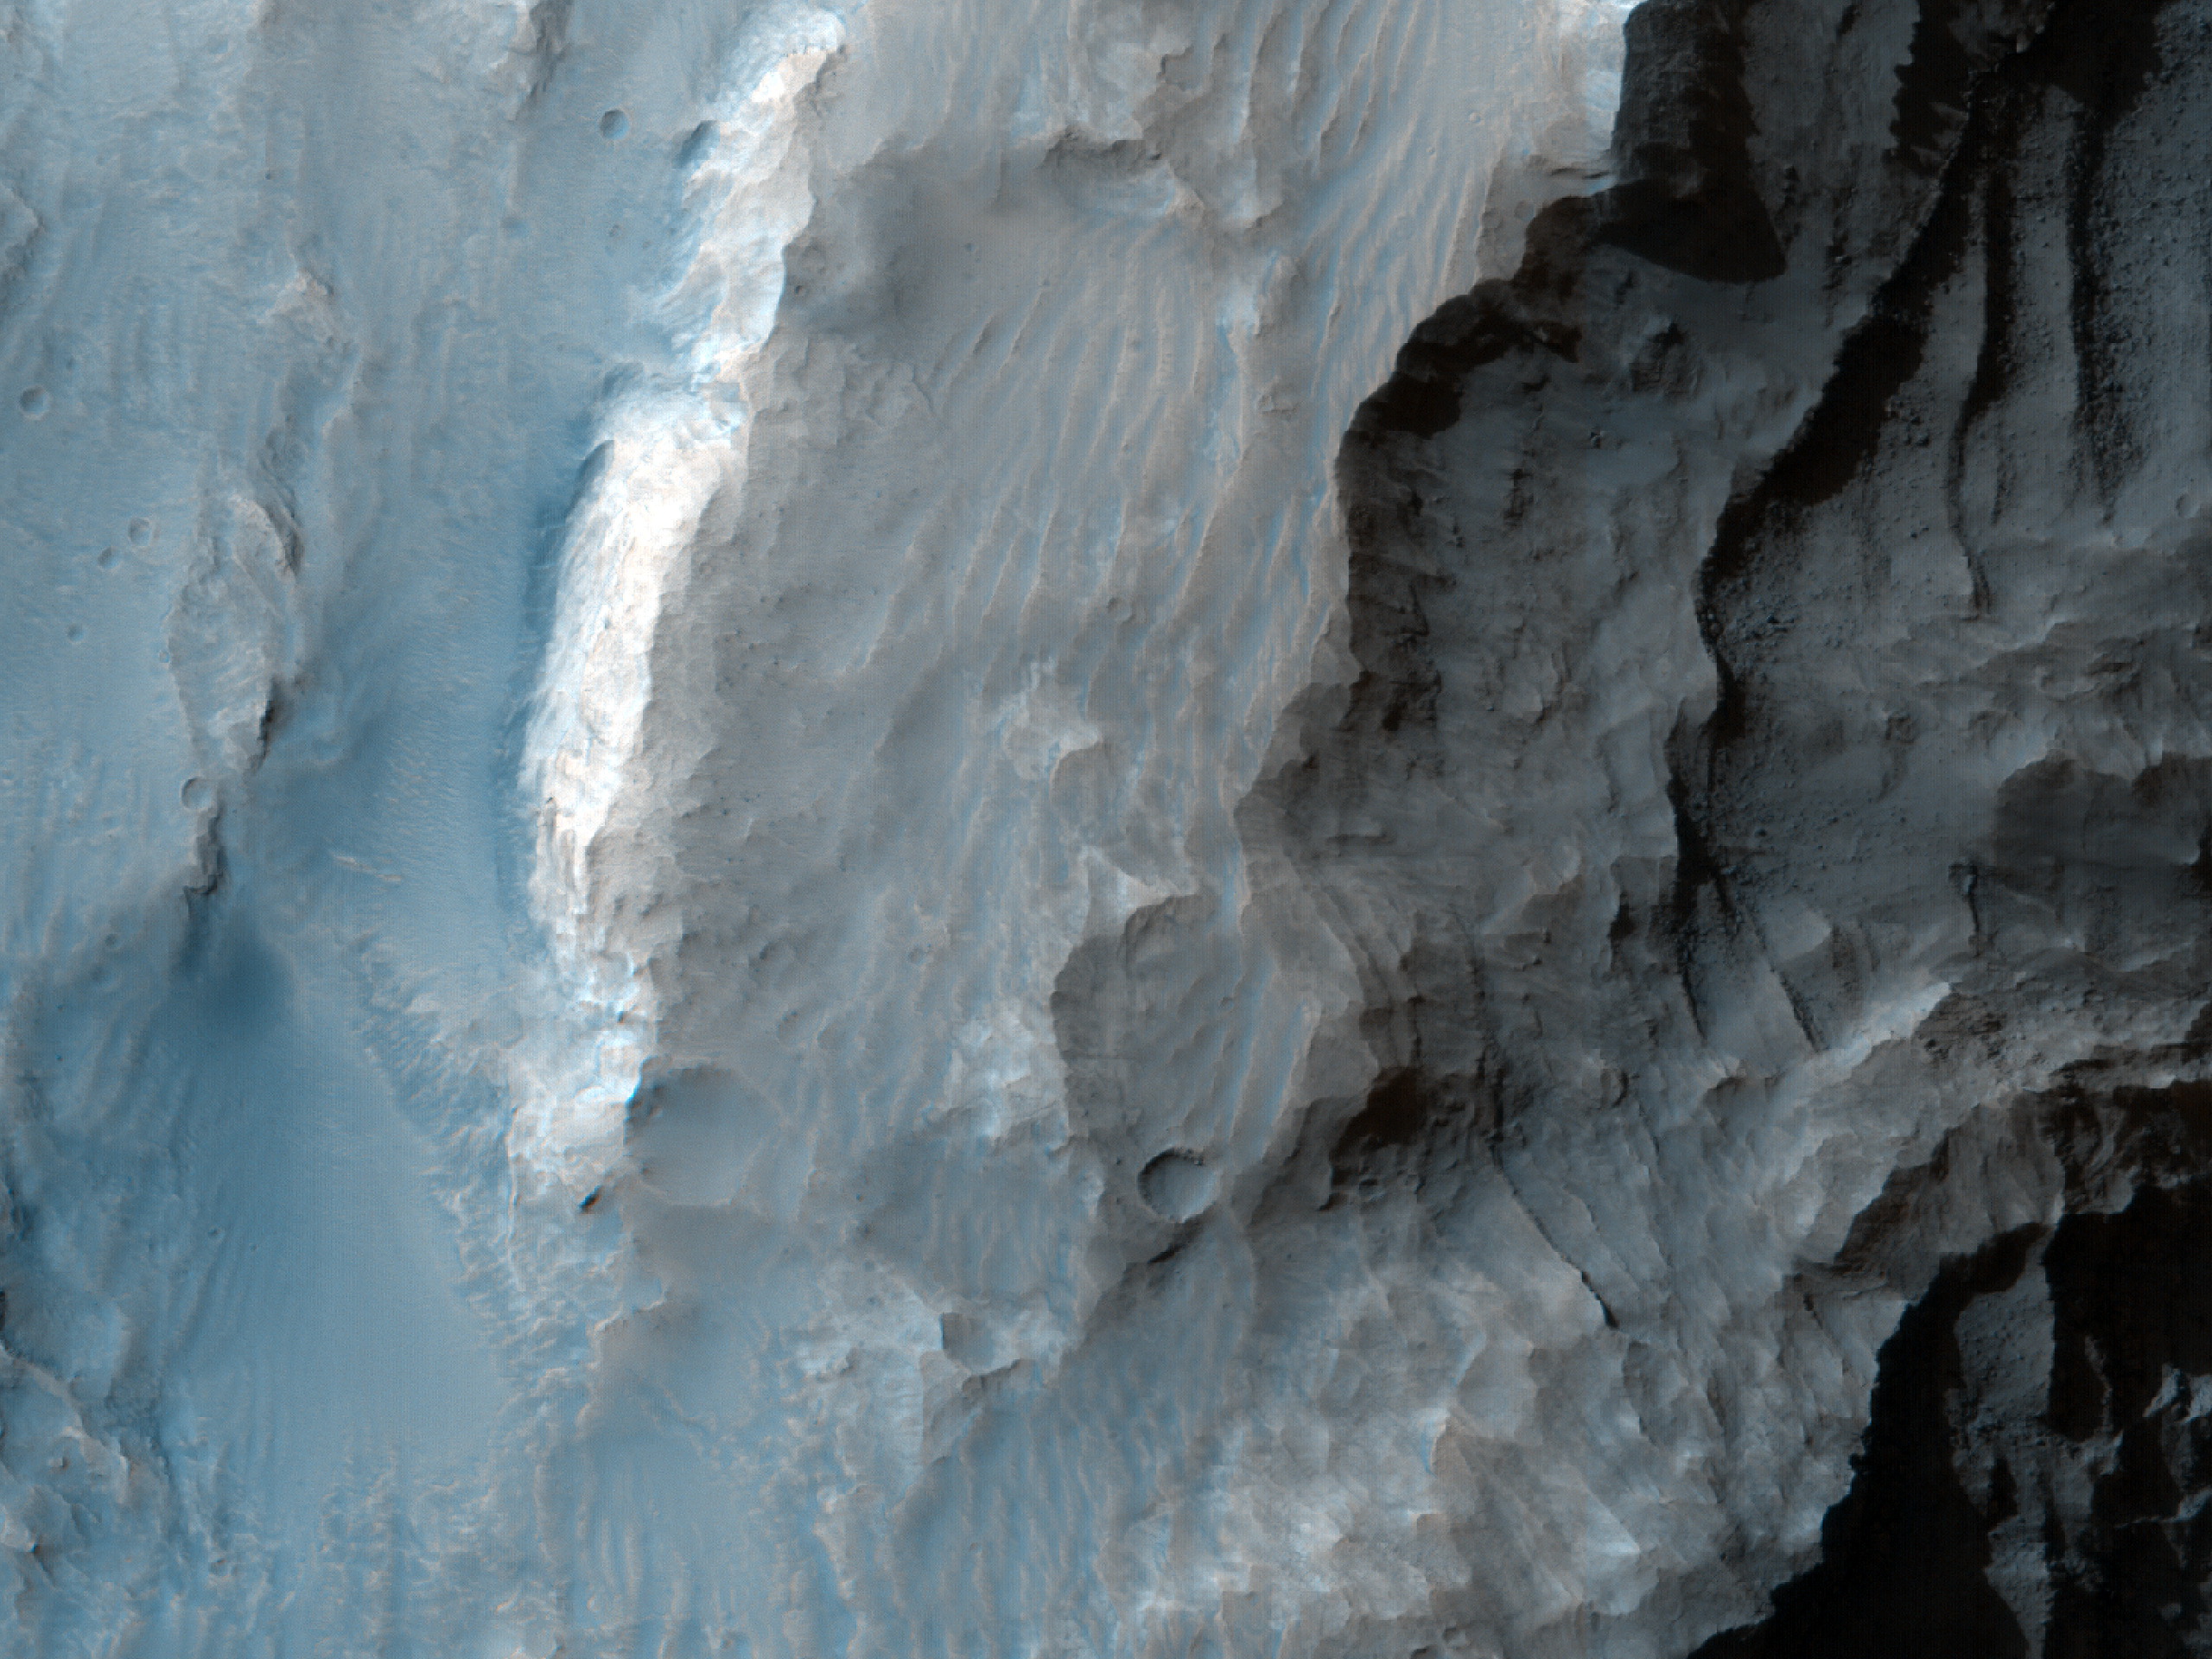 منحدرات في فوهة جيل (Gale Crater)